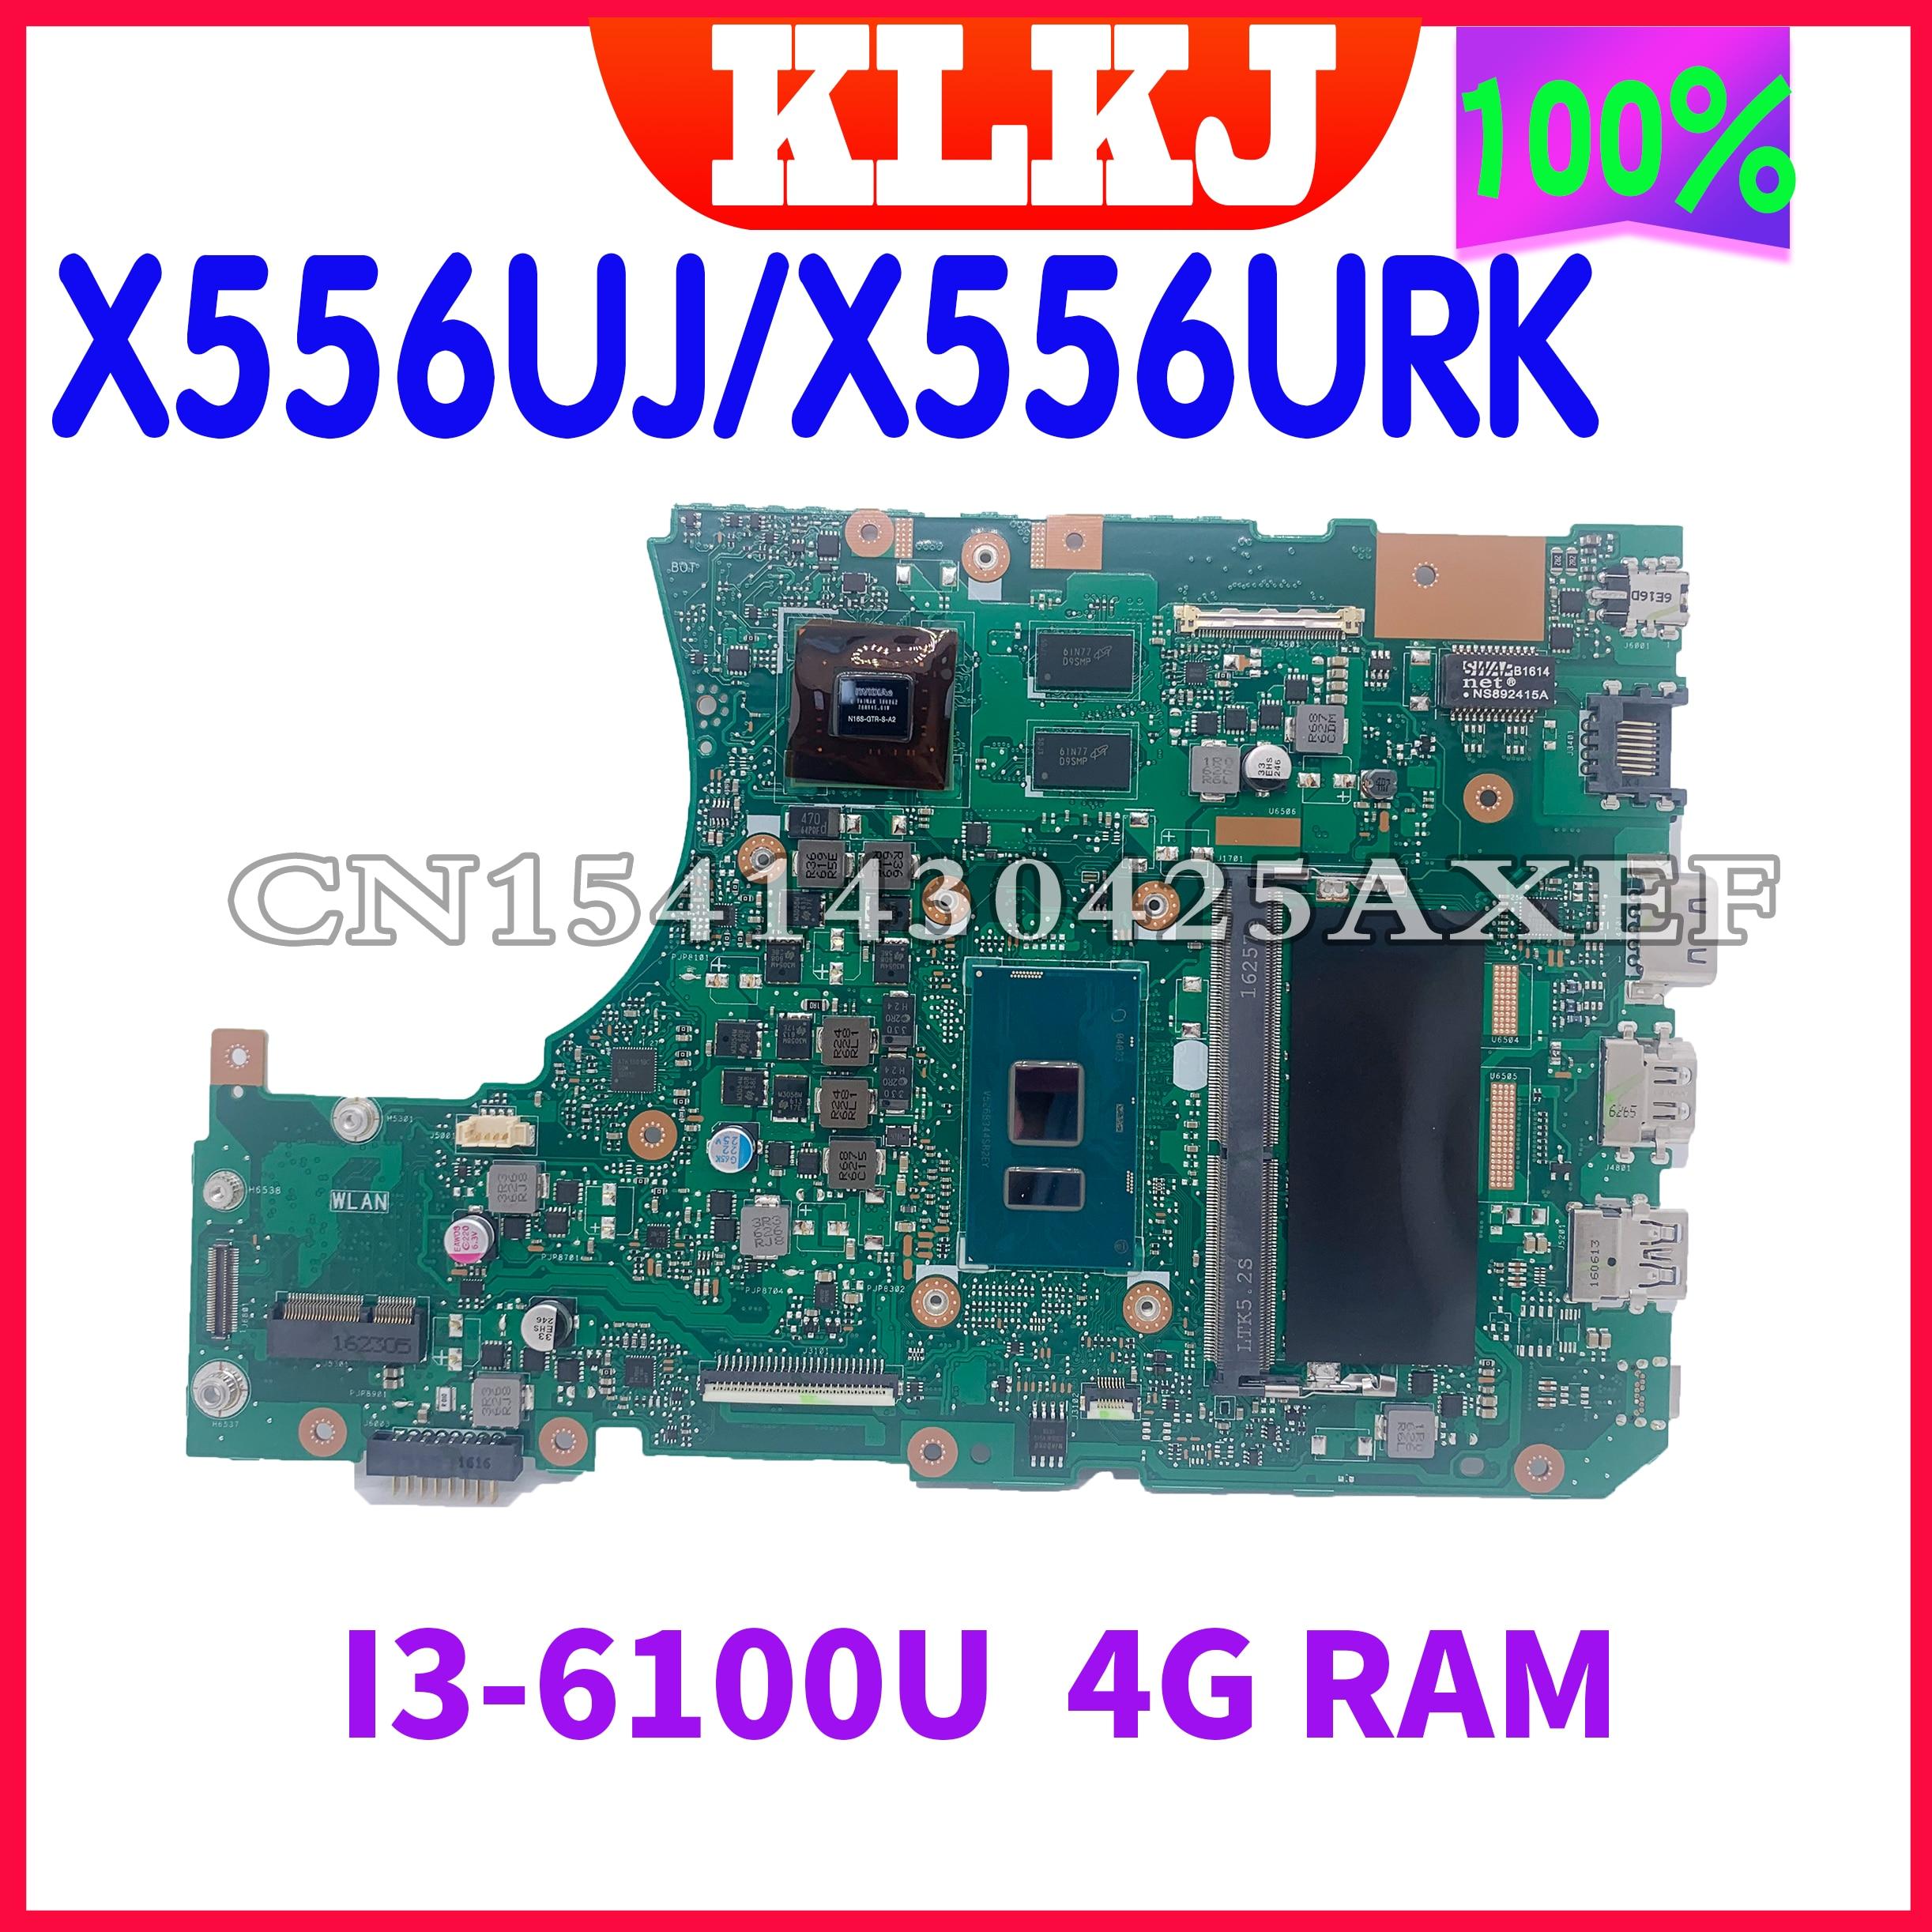 Dinzi جديد X556UV اللوحة لابتوب ASUS X556UV X556UR X556UB X556U X556UQK اللوحة الأصلية 4GB-RAM I3-6100U GT940MX-2G